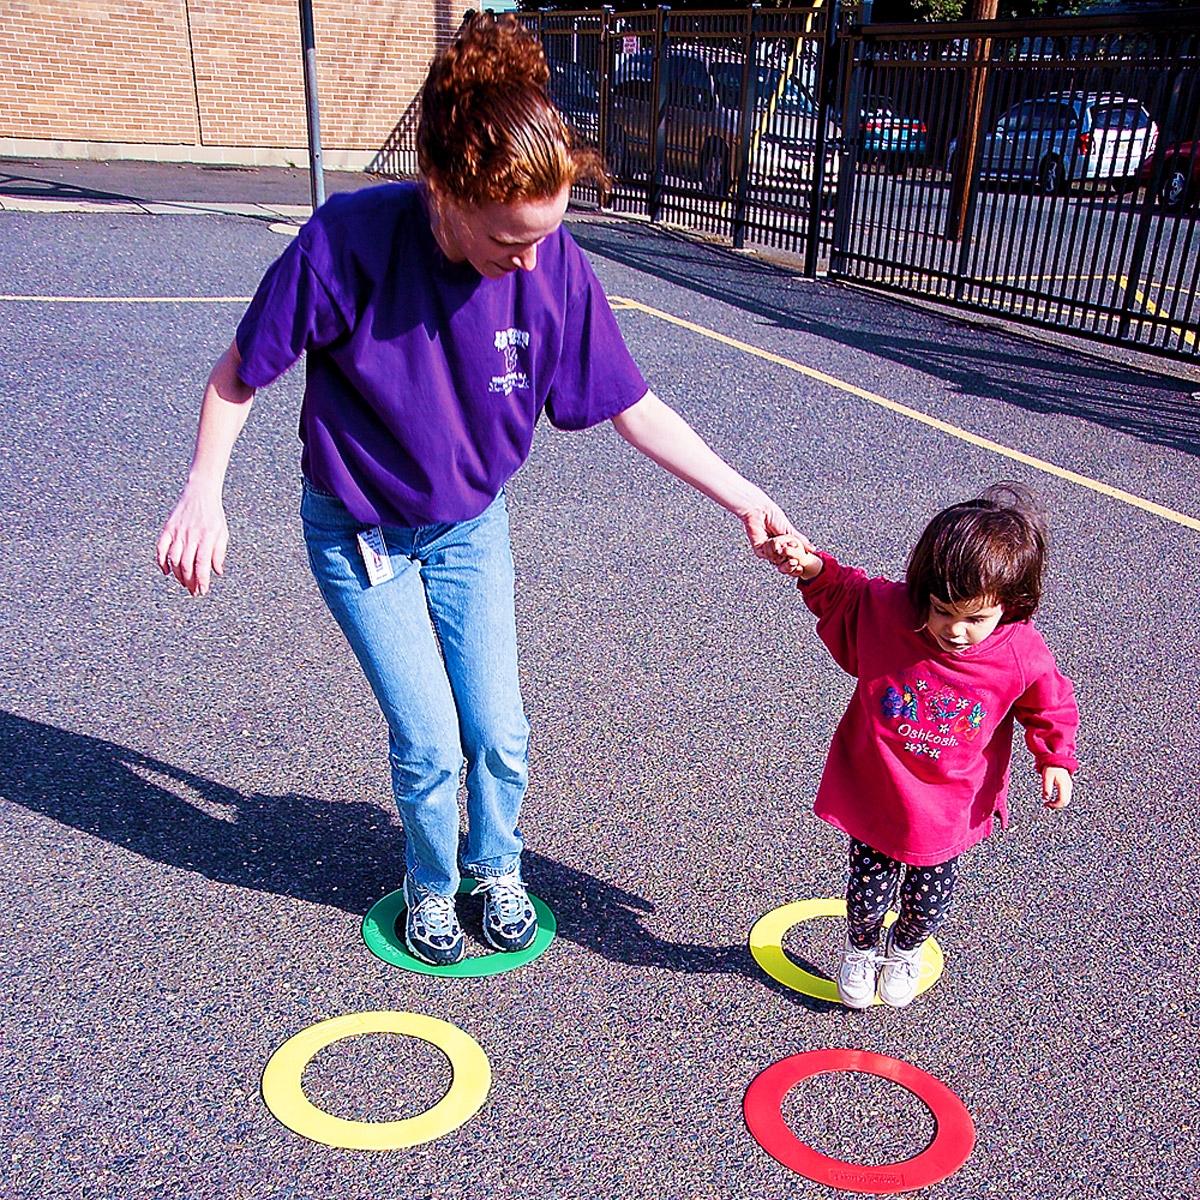 woman helping toddler walk through agility course set marker course